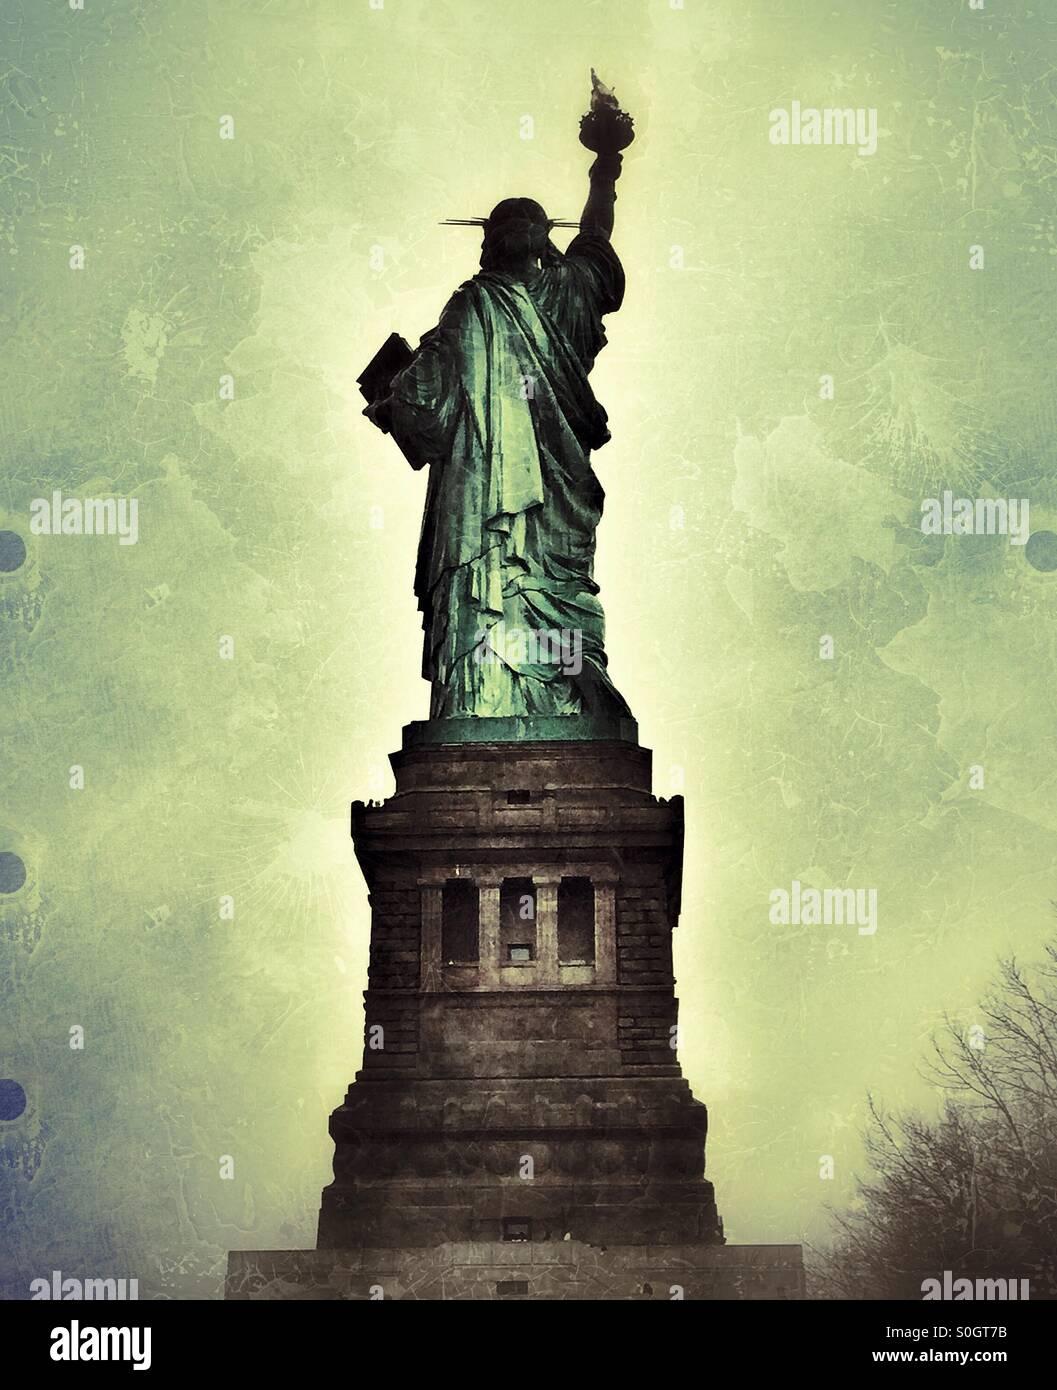 Rückansicht der Freiheitsstatue, New York, USA Stockbild